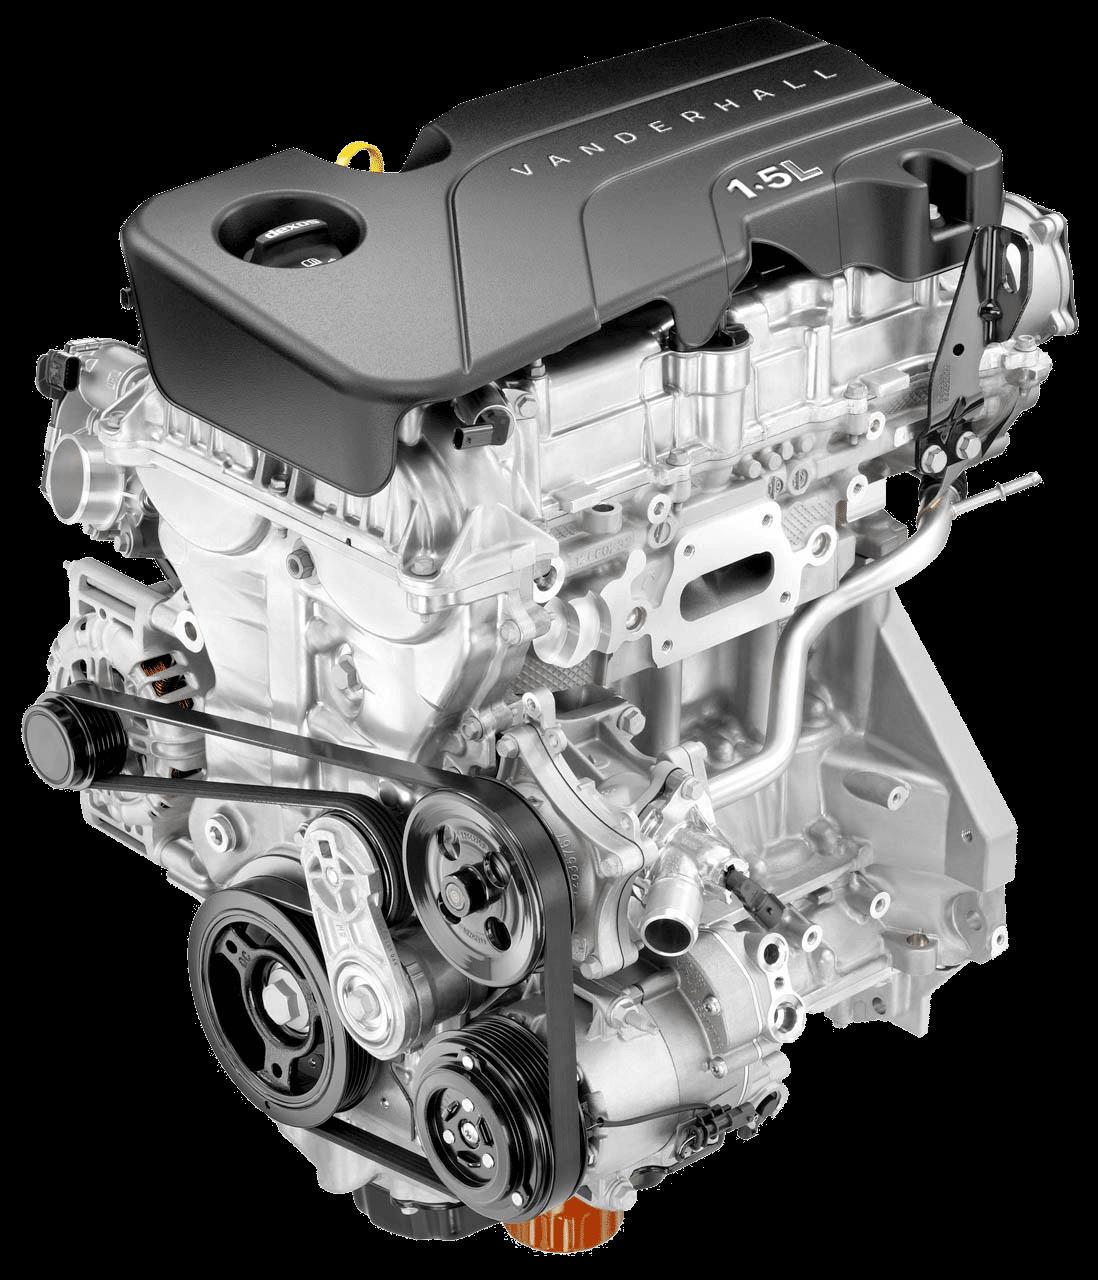 Venice Engine 1.5